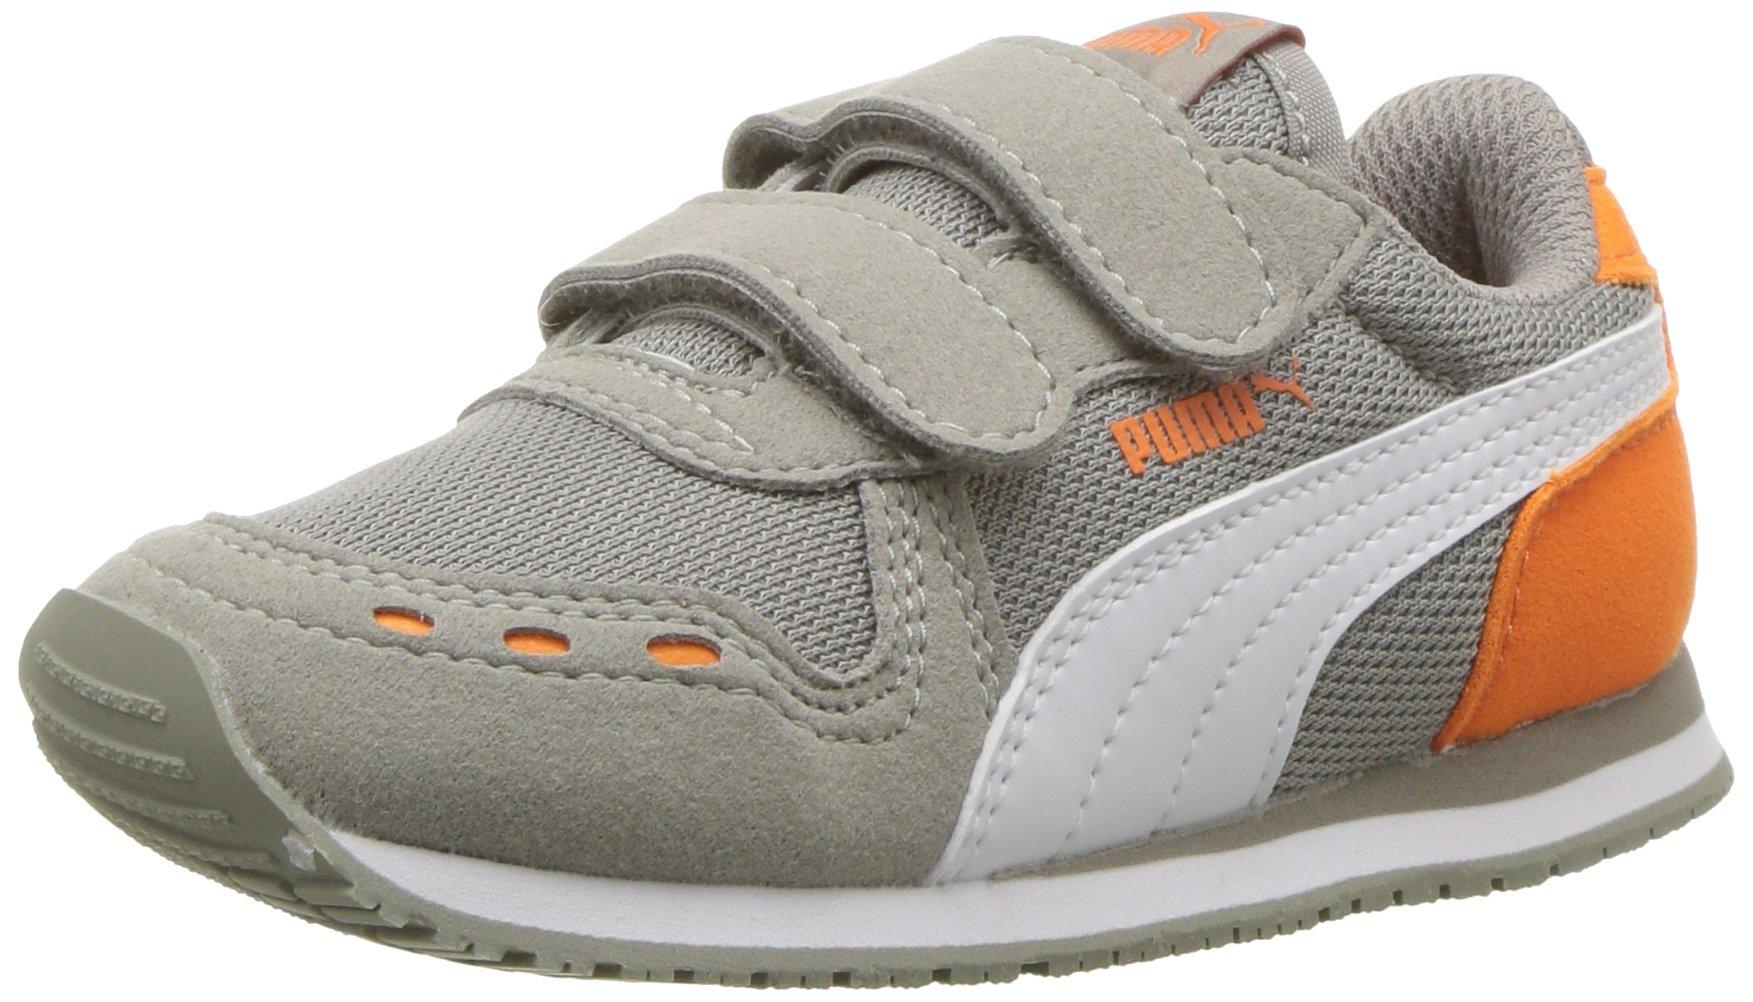 PUMA Kids' Cabana Racer Mesh V PS Sneaker, rock ridge-puma white-vibrant orange, 12.5 M US Little Kid